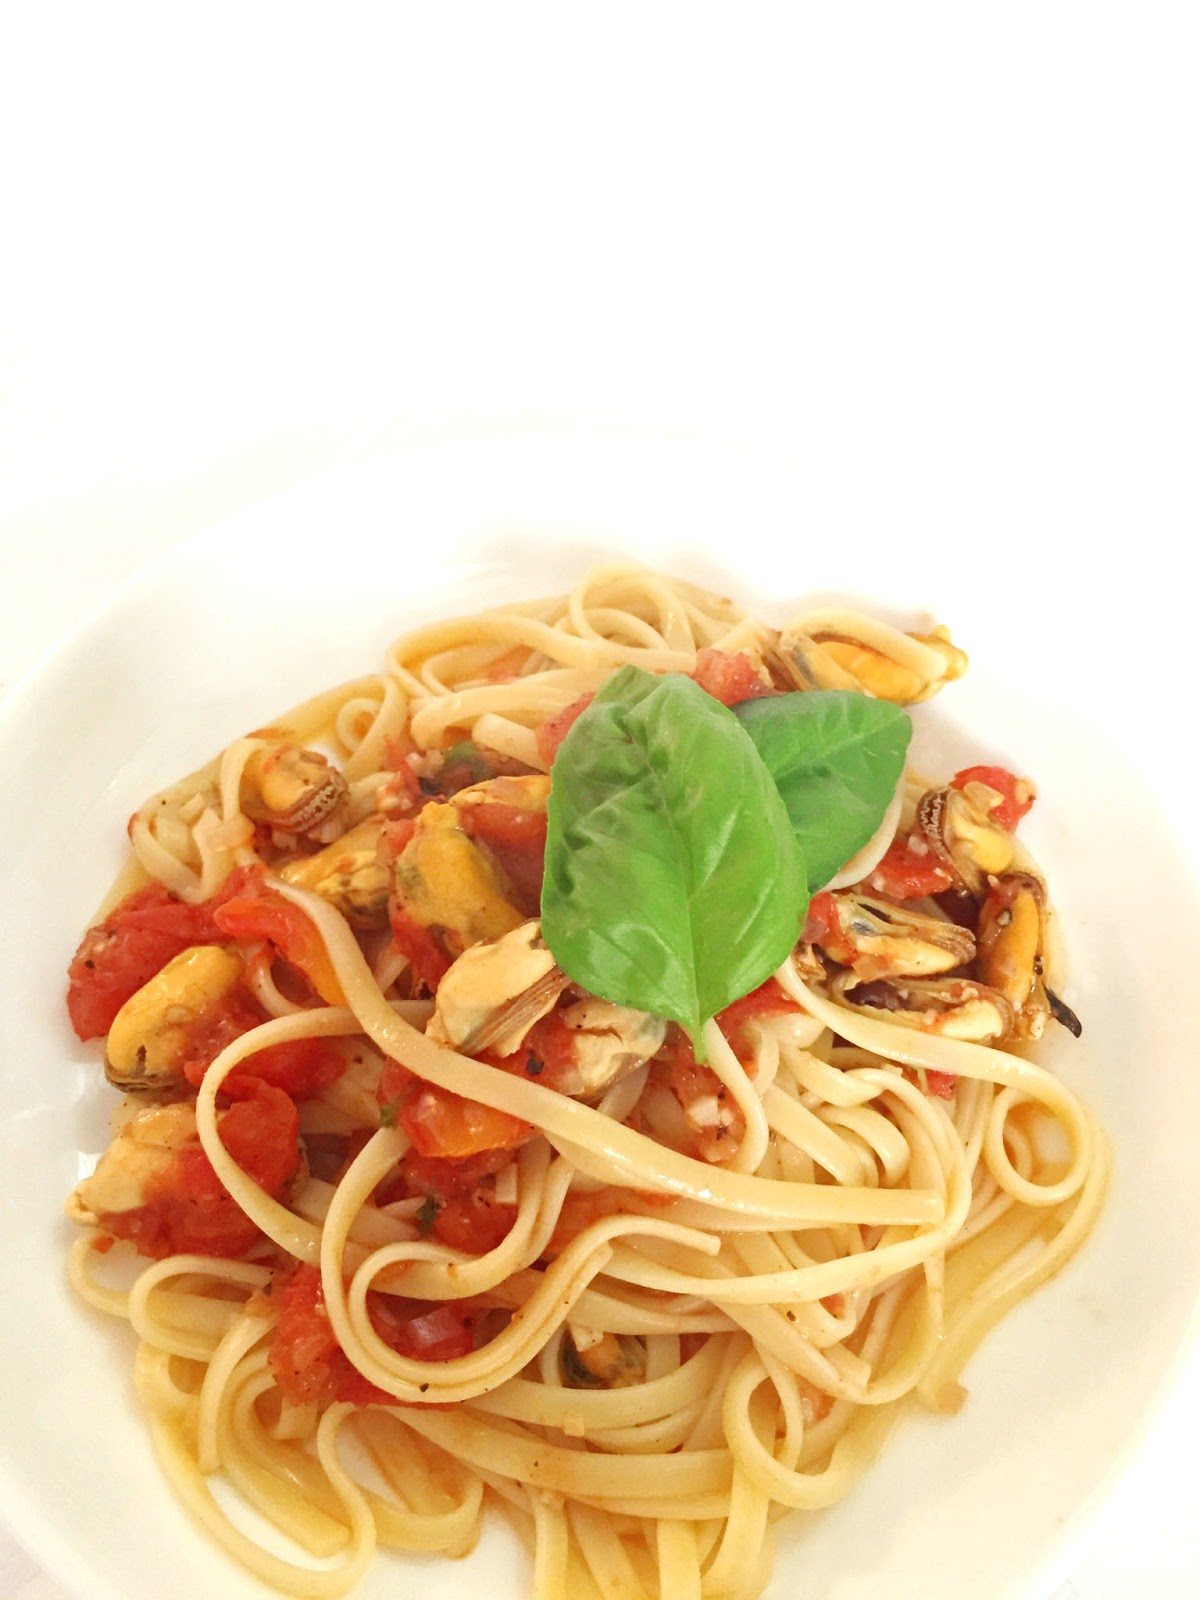 cuisiner bien pasta mit muscheln in tomatensauce. Black Bedroom Furniture Sets. Home Design Ideas